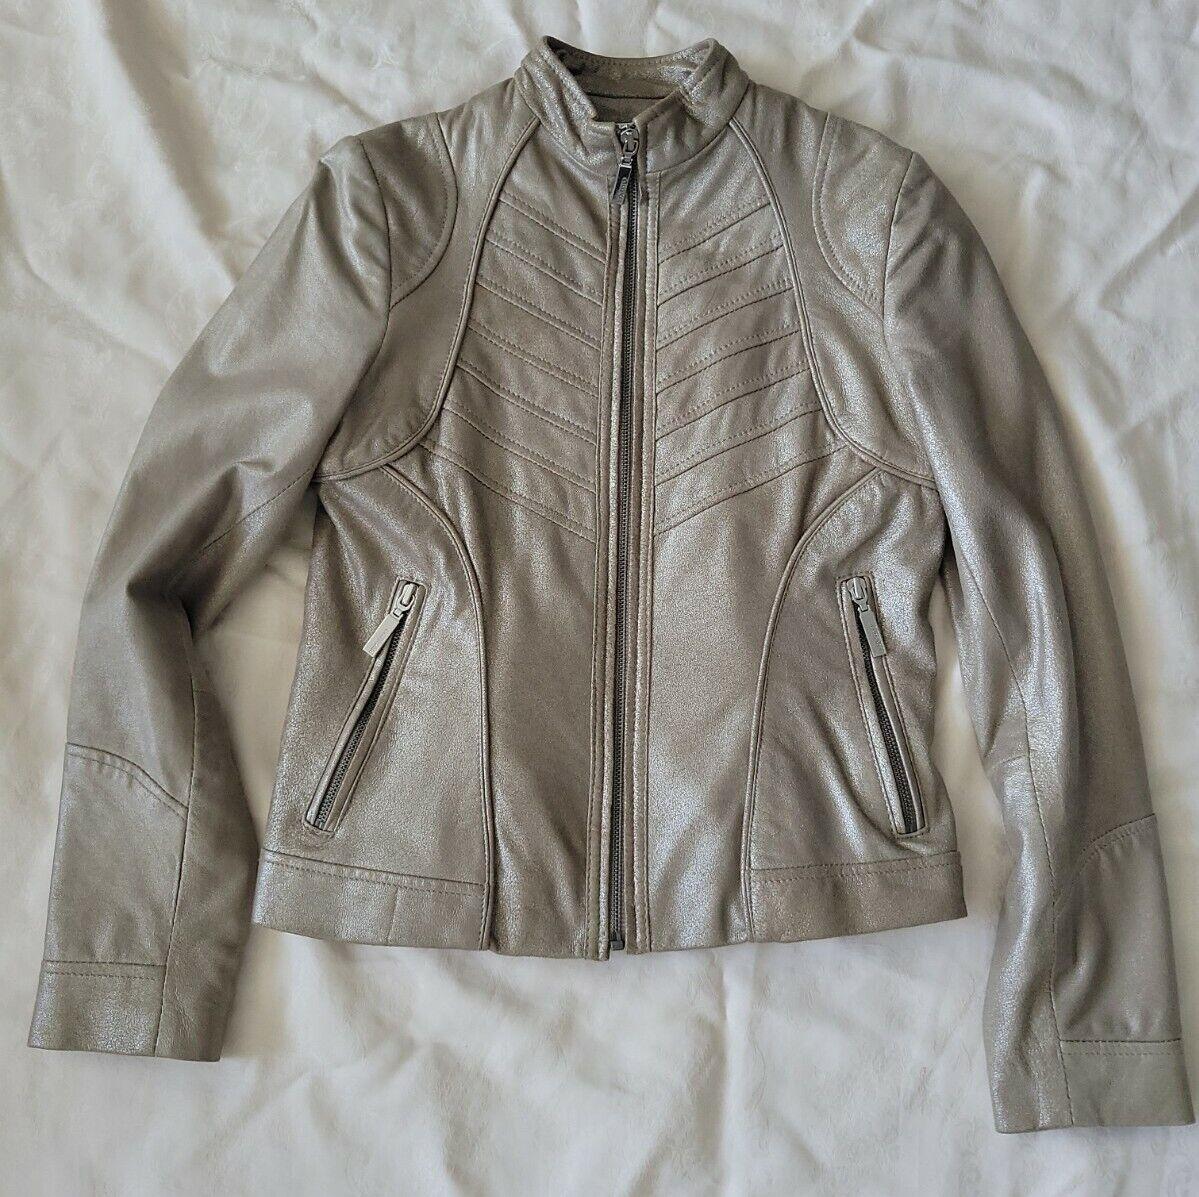 BERNARDO Bronzed Leather Motto Jacket women's petite xs, EUC